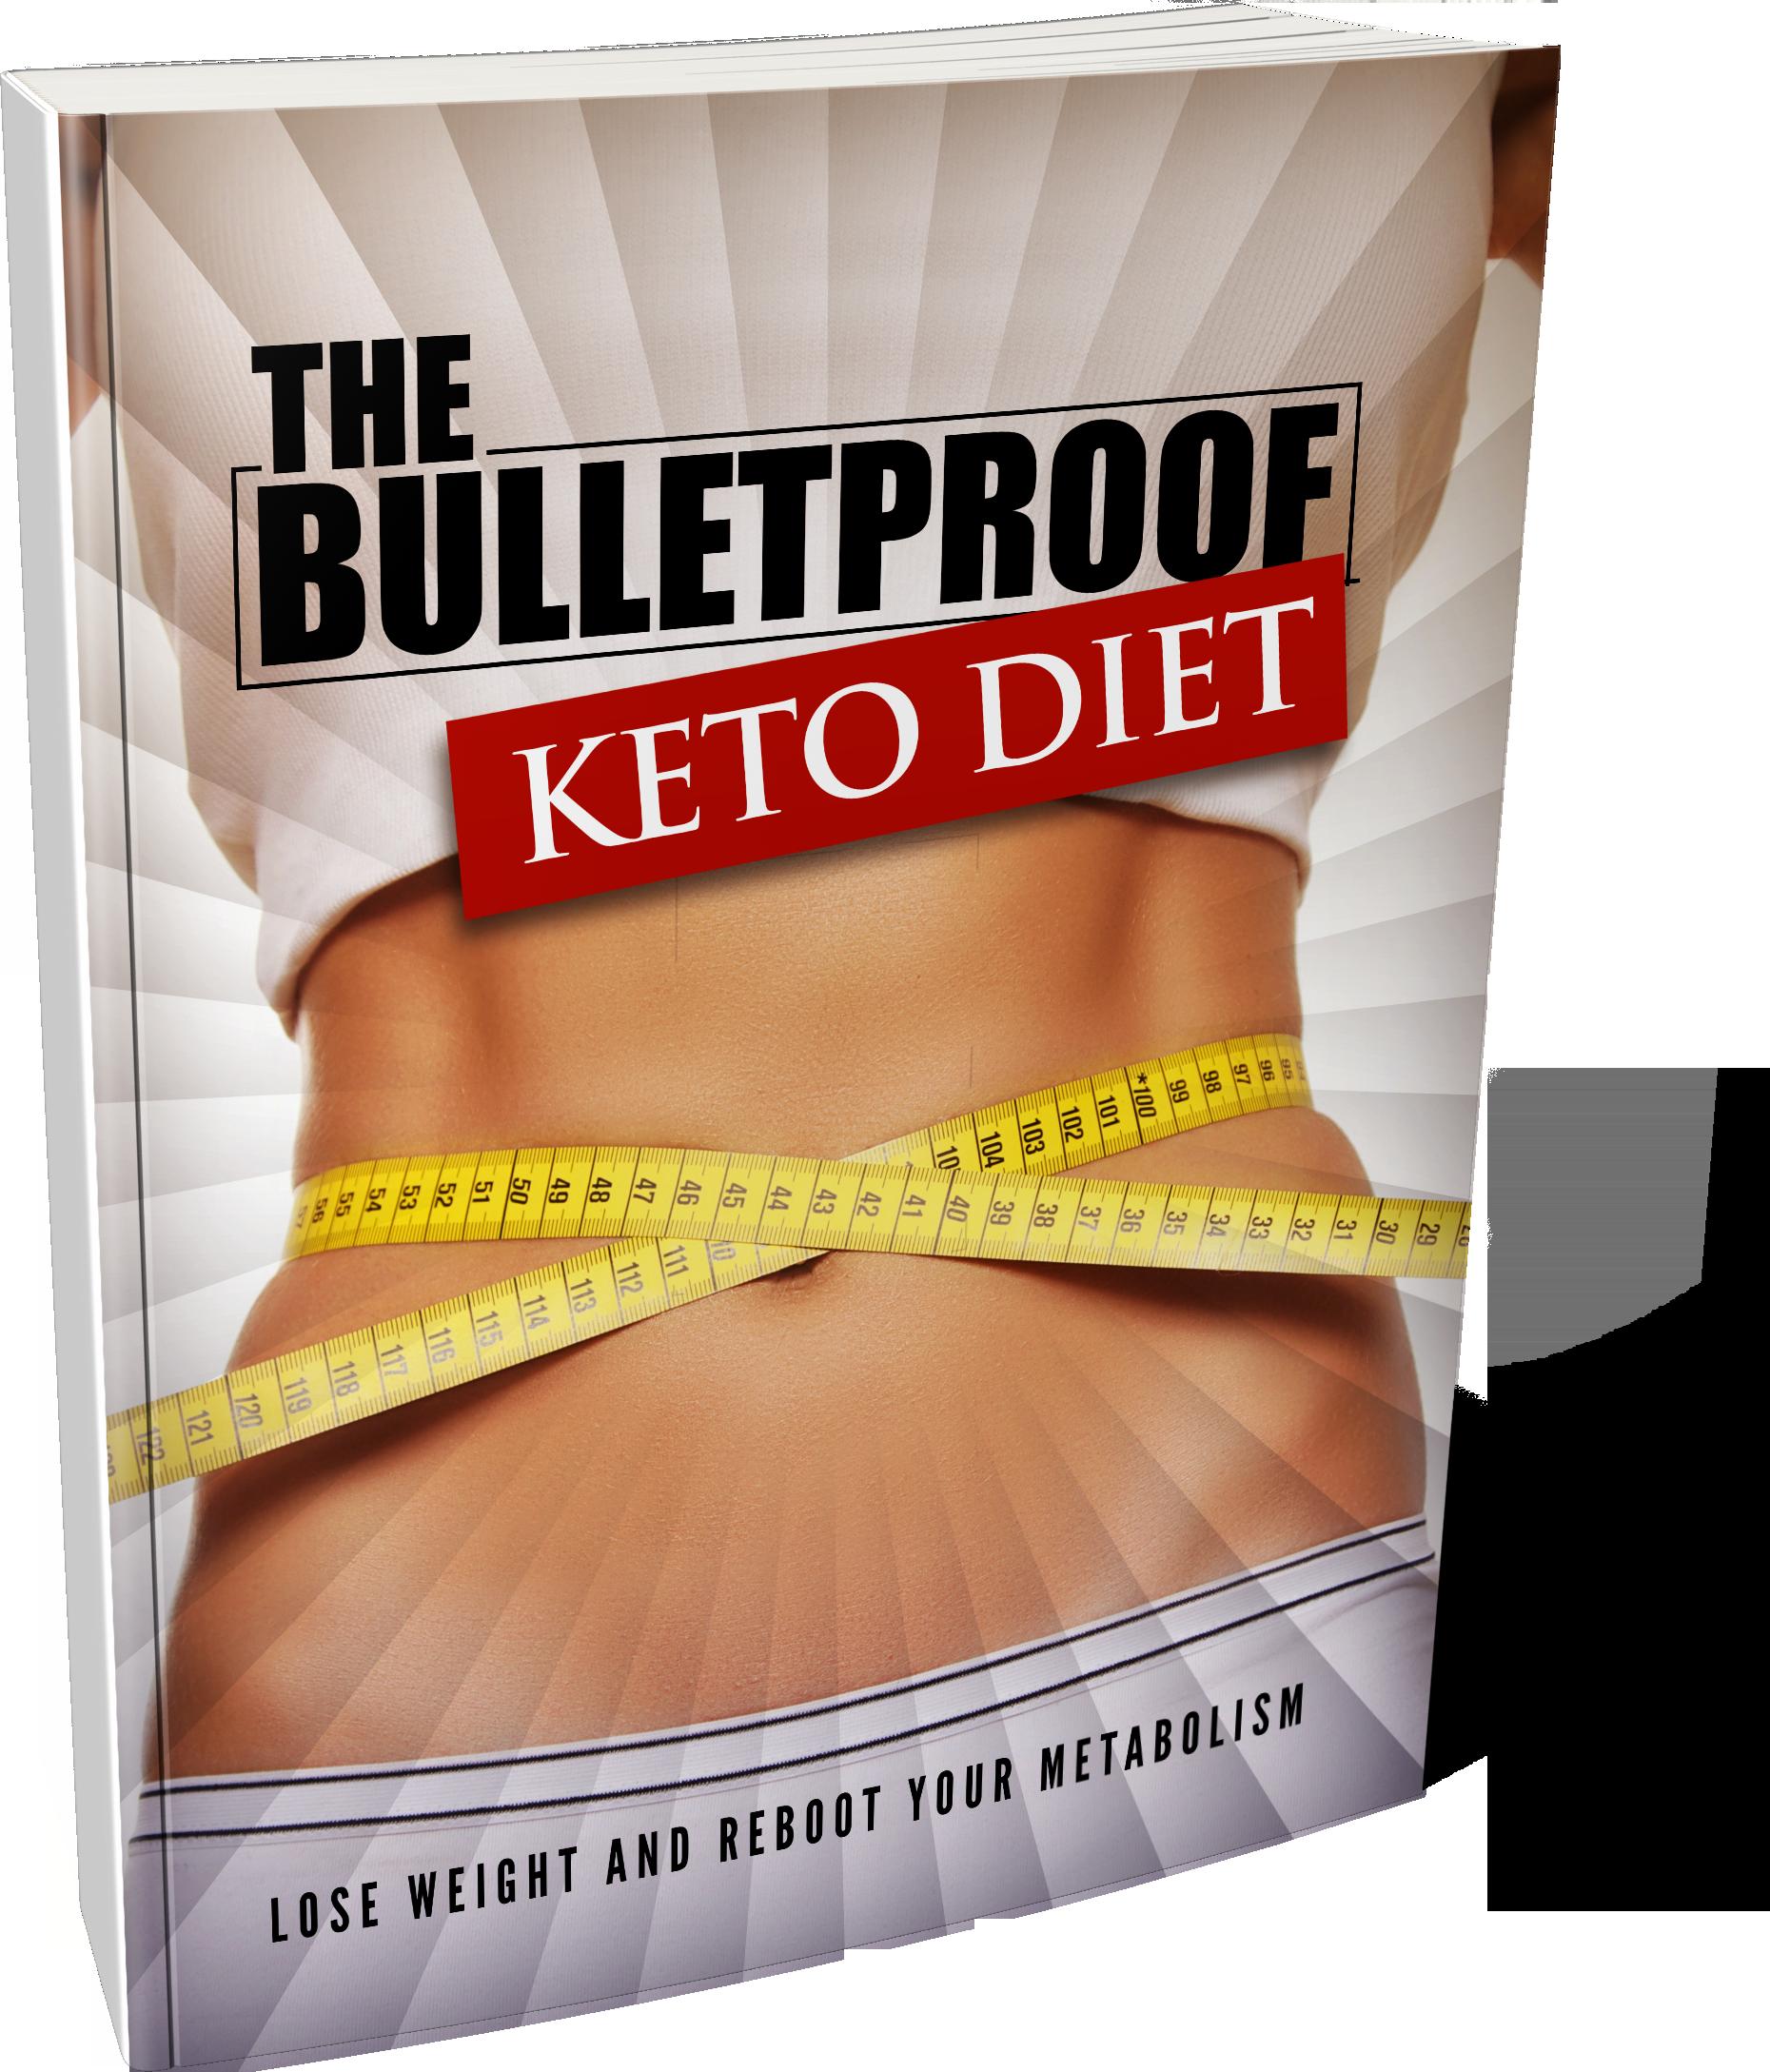 The Bulletproof Keto Diet (Lose Weight And Reboot Your Metabolism) Ebook's Ebook Image